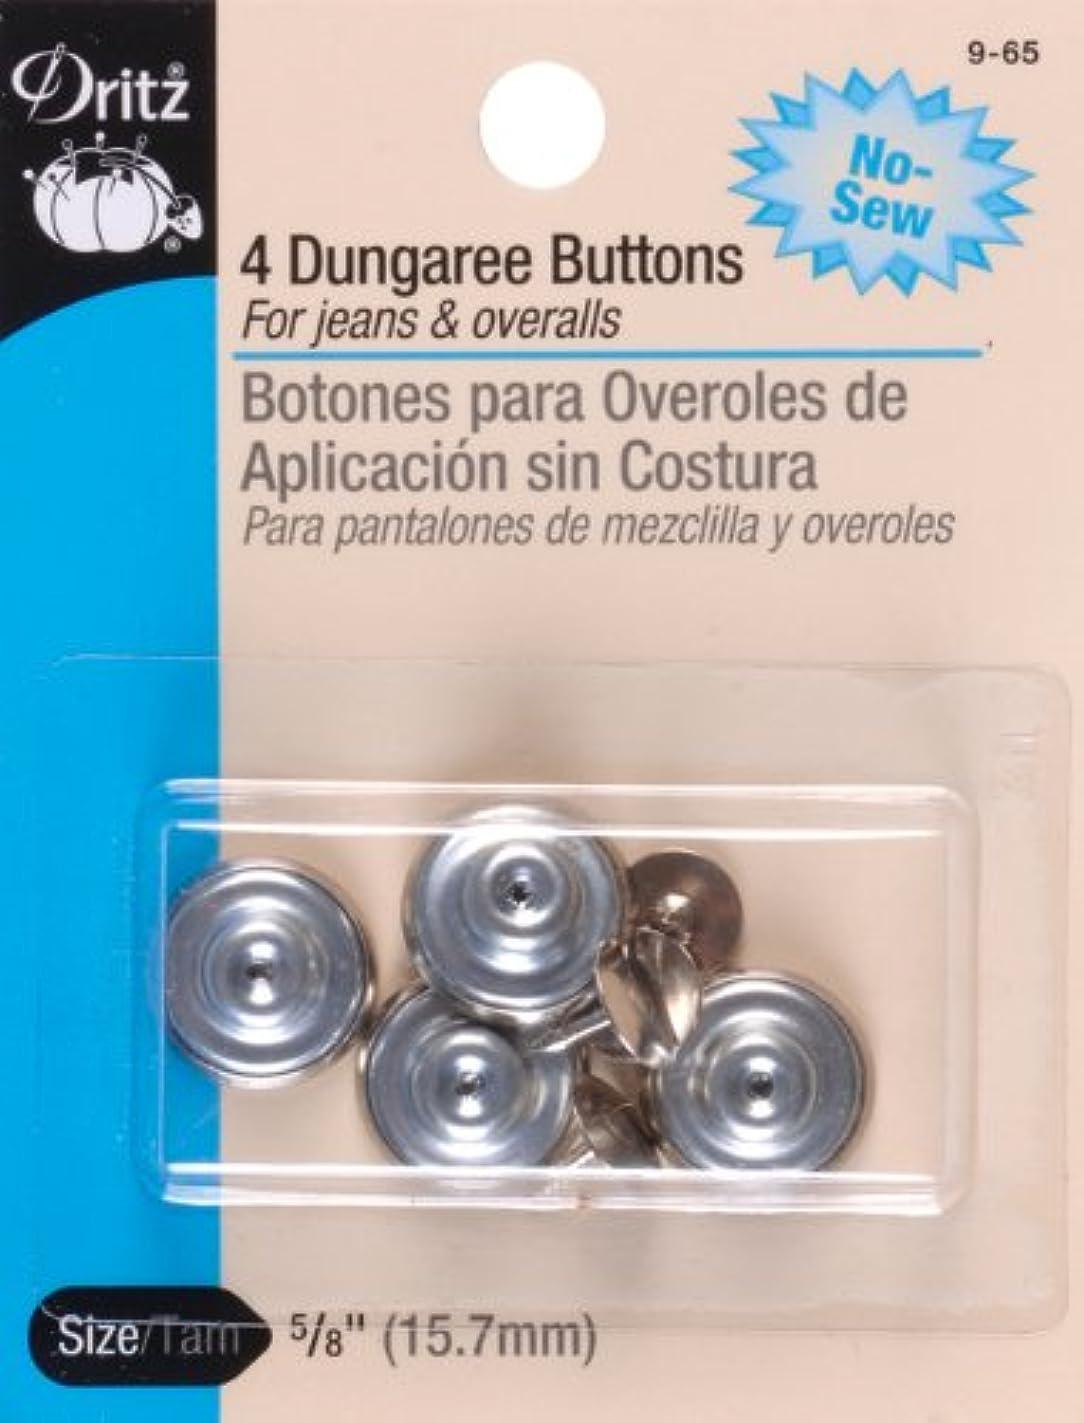 Dritz No-Sew Dungaree Buttons 5/8 4/Pkg-Nickel qnl18886407